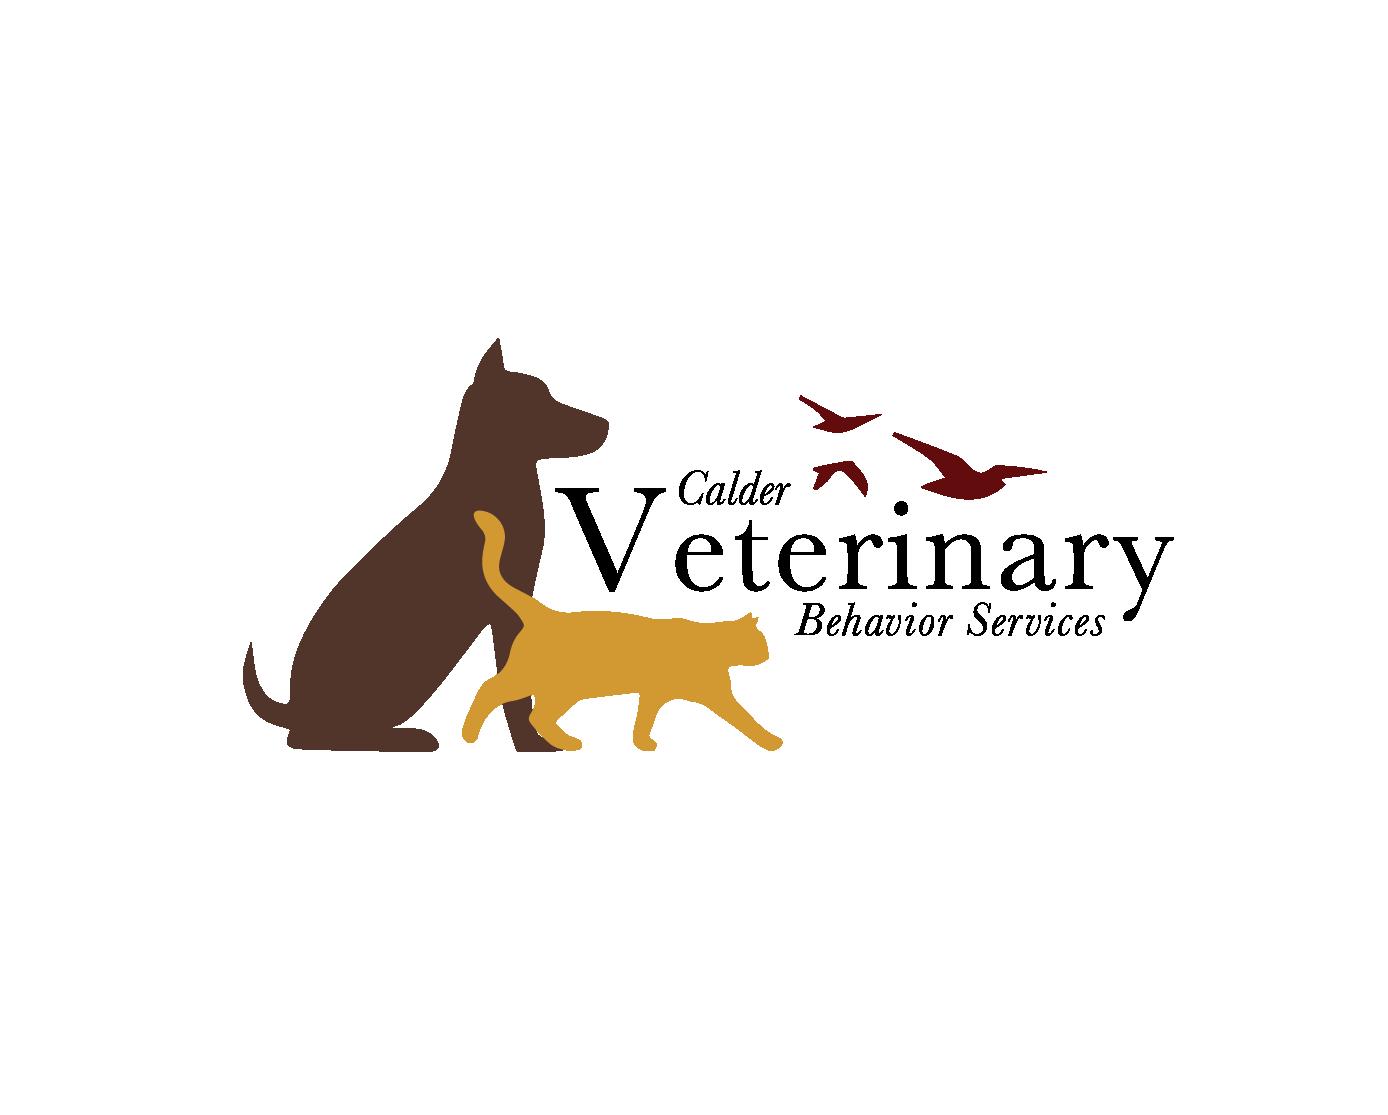 Calder Veterinary Behavior Services